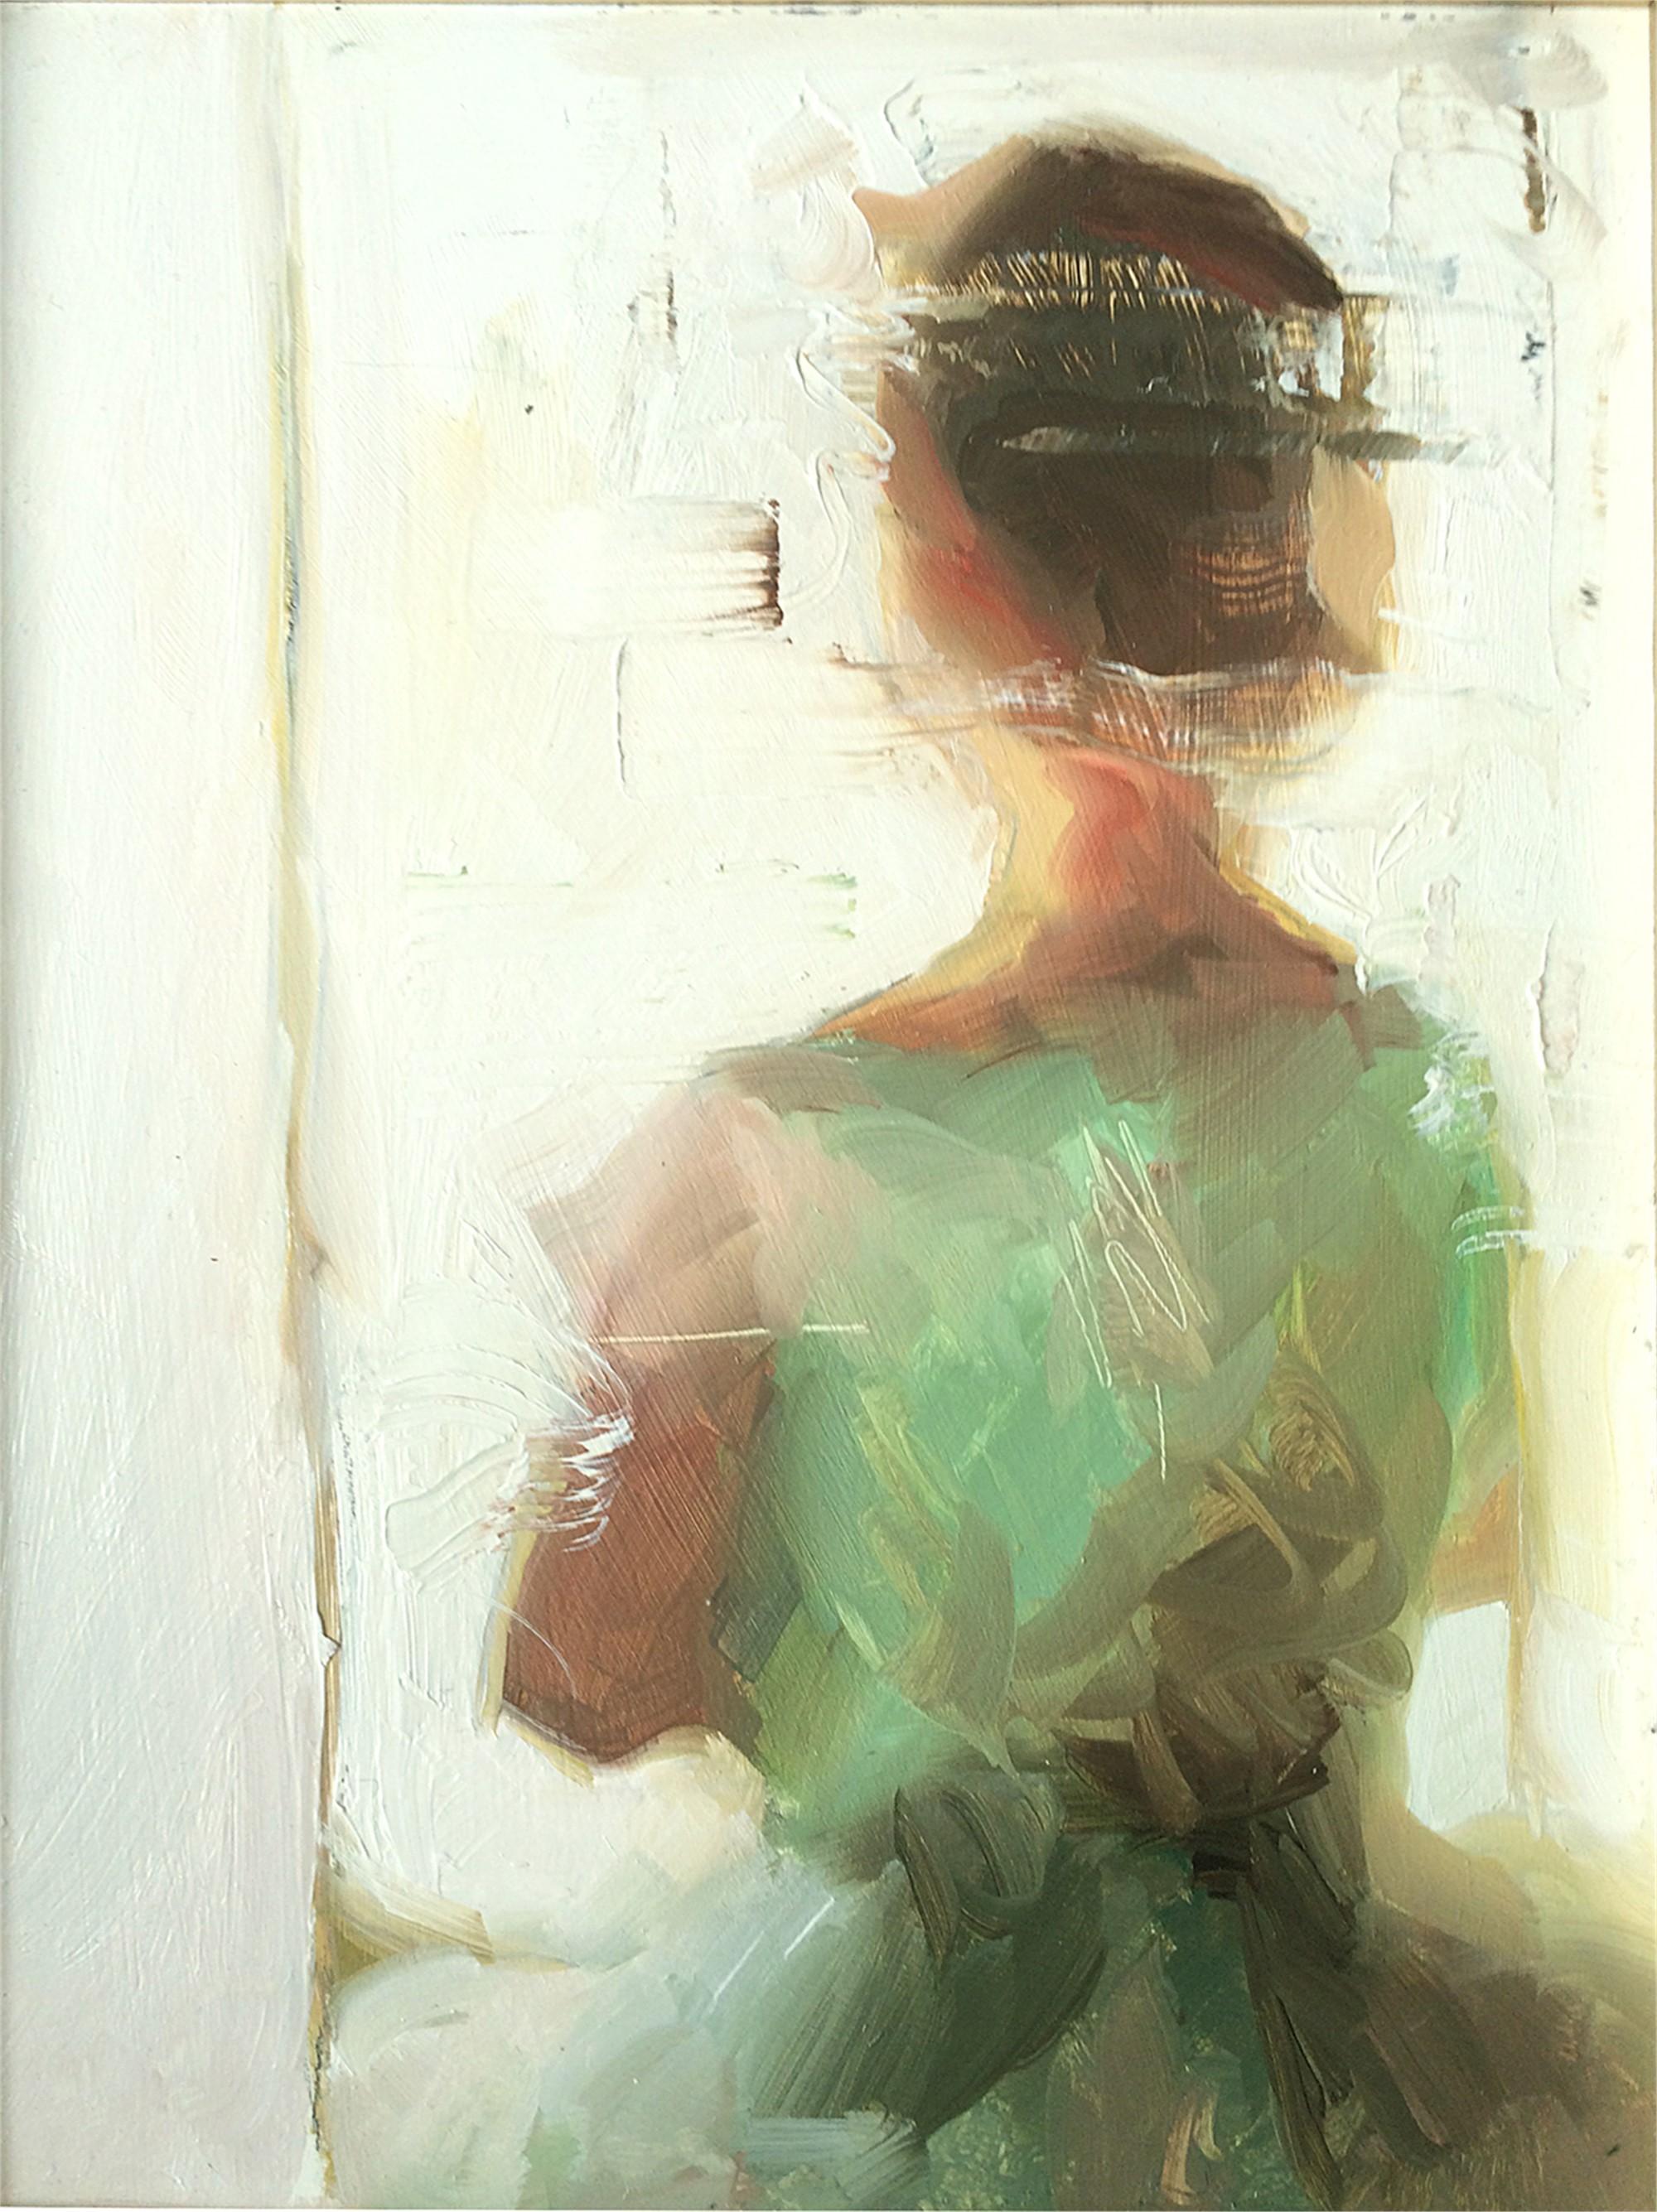 Kailyn by Britt Snyder